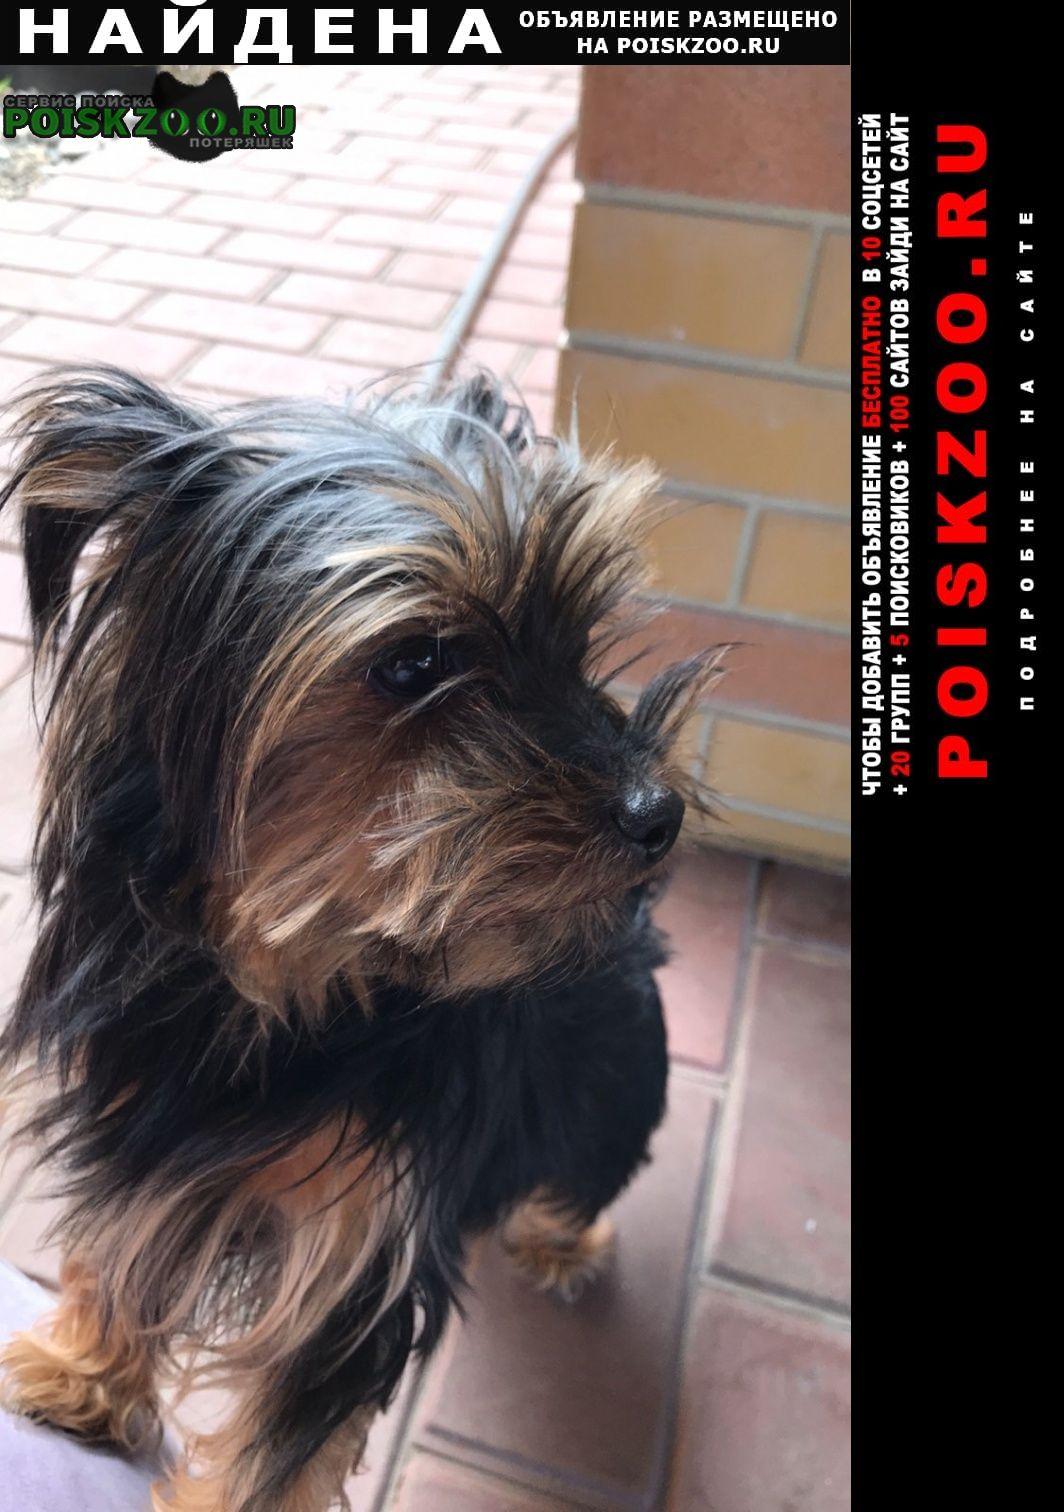 Найдена собака Саратов